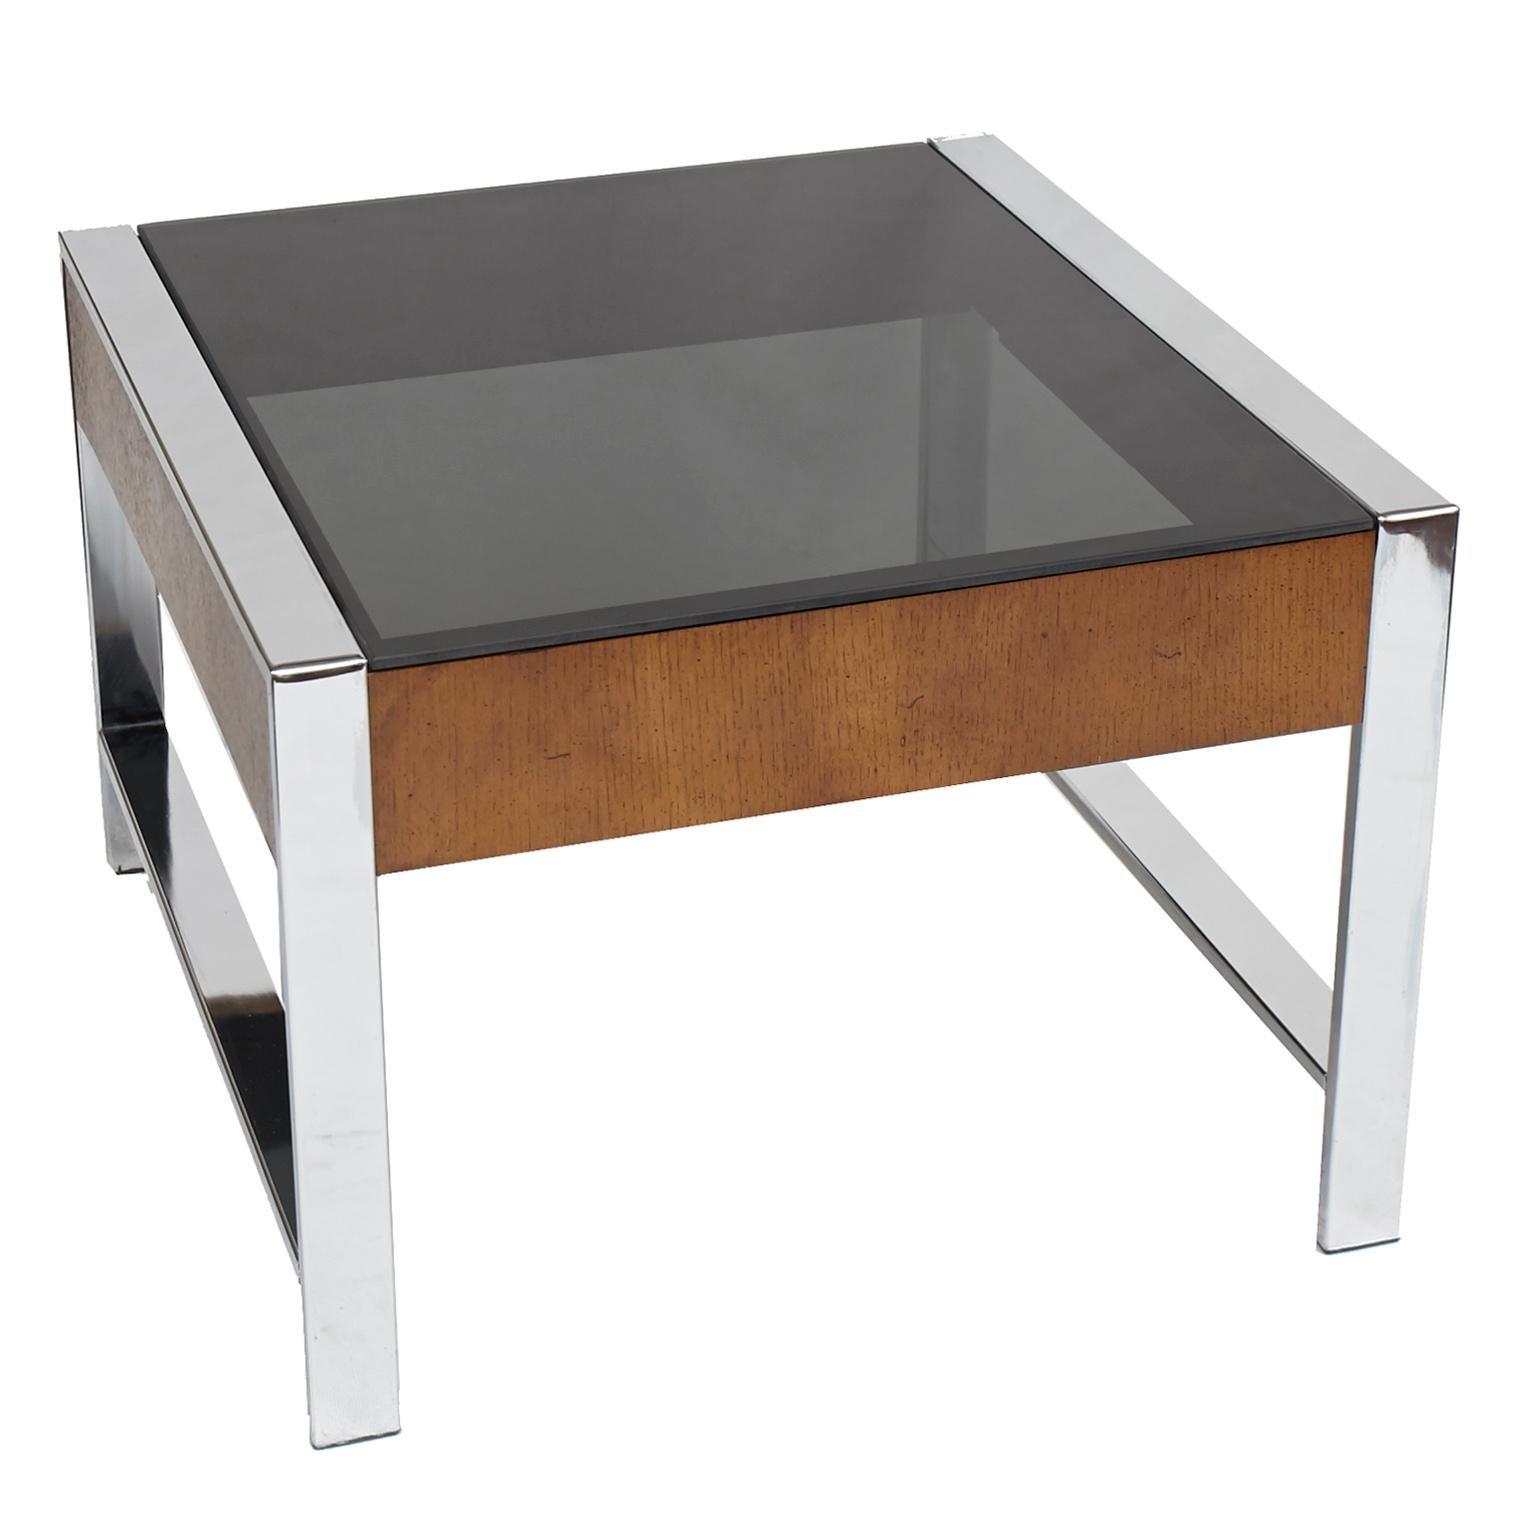 Pair Of Mid Century Modern Chrome, Walnut Veneer And Smoke Glass End Tables